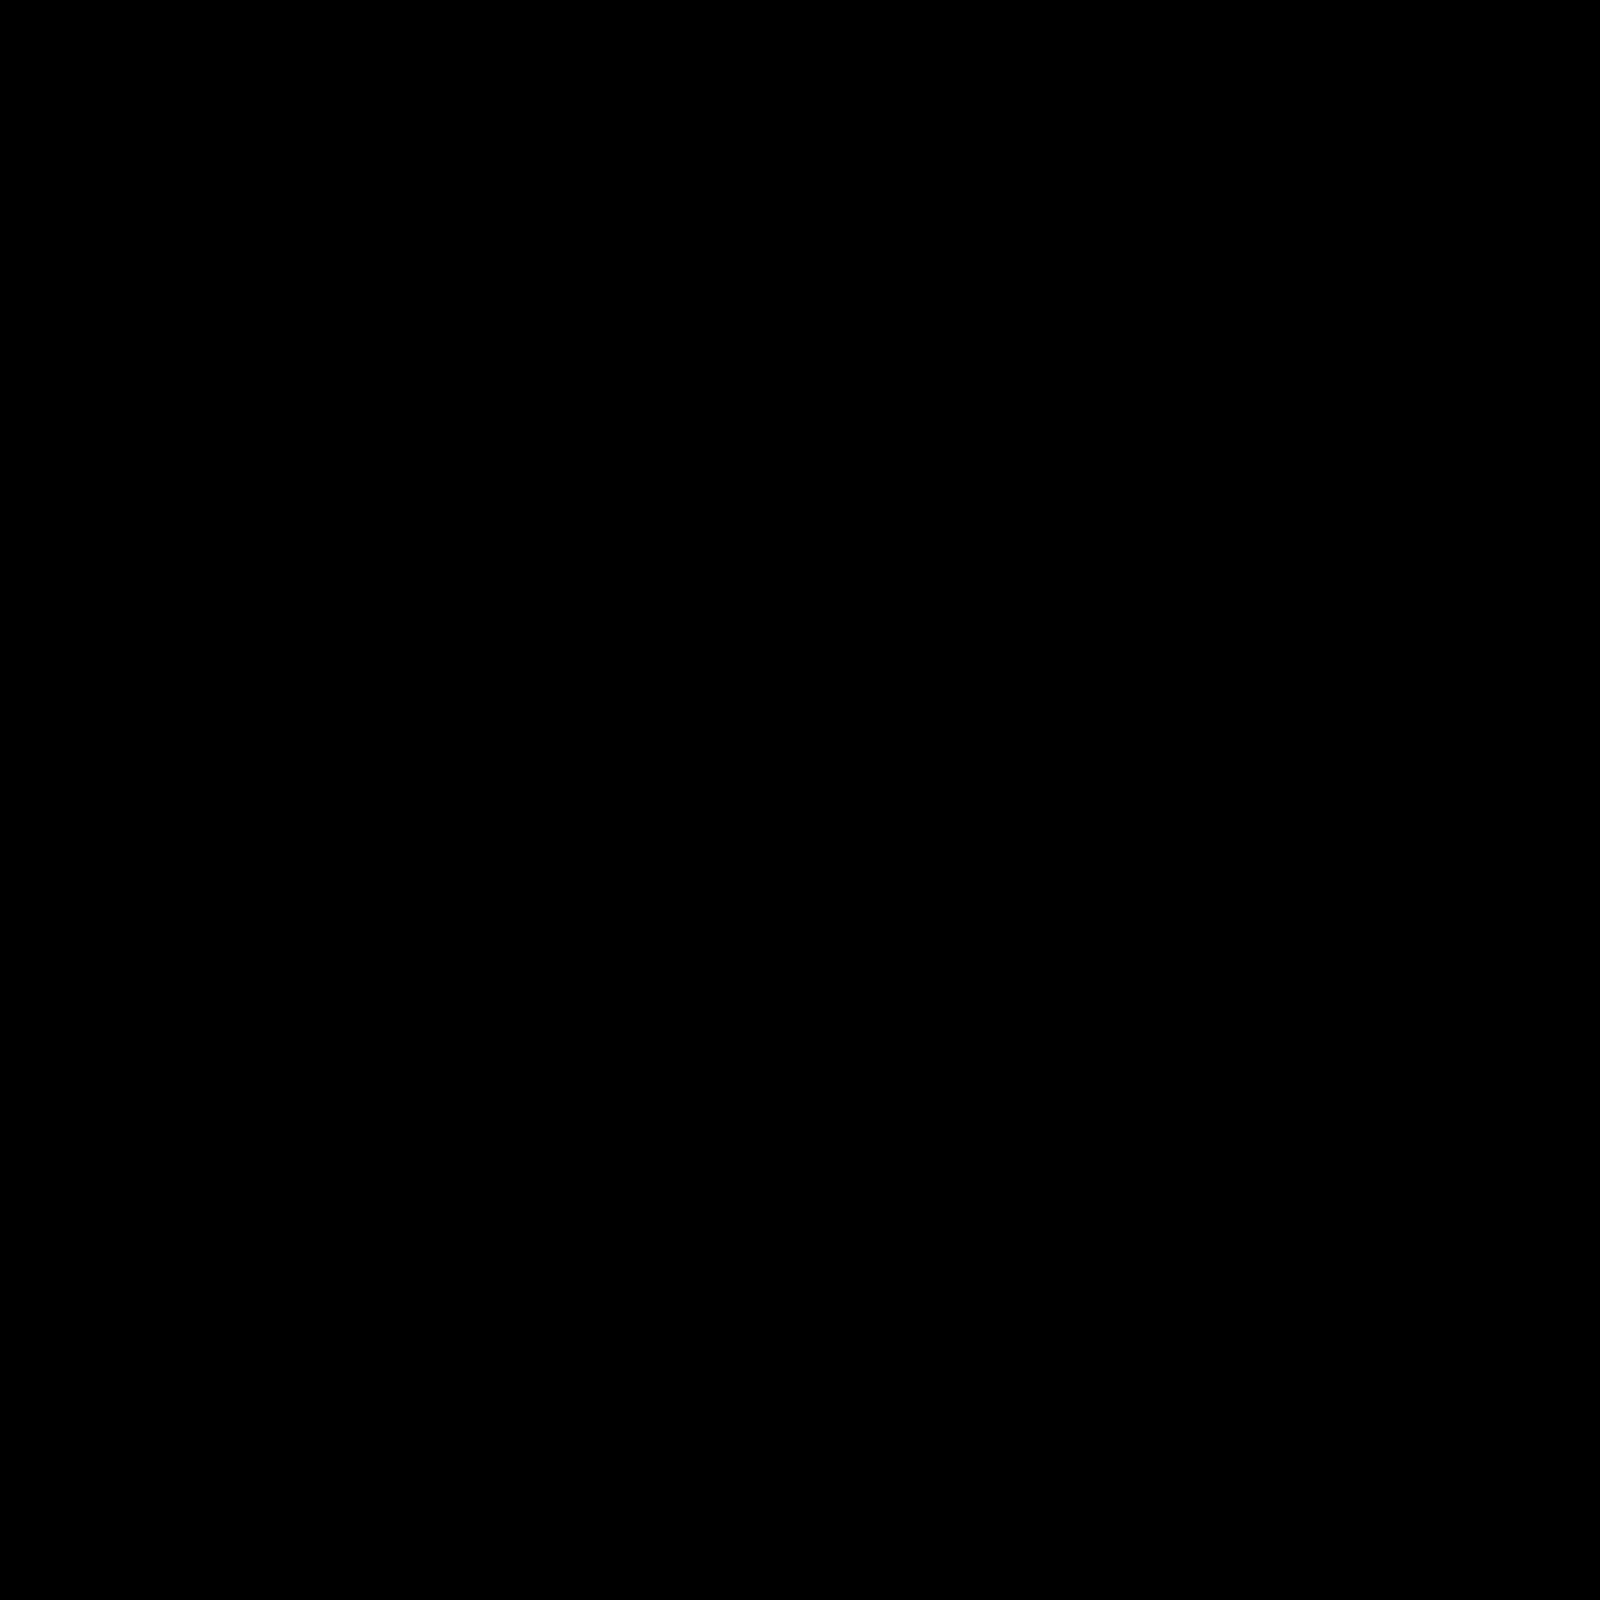 Royal Tent icon